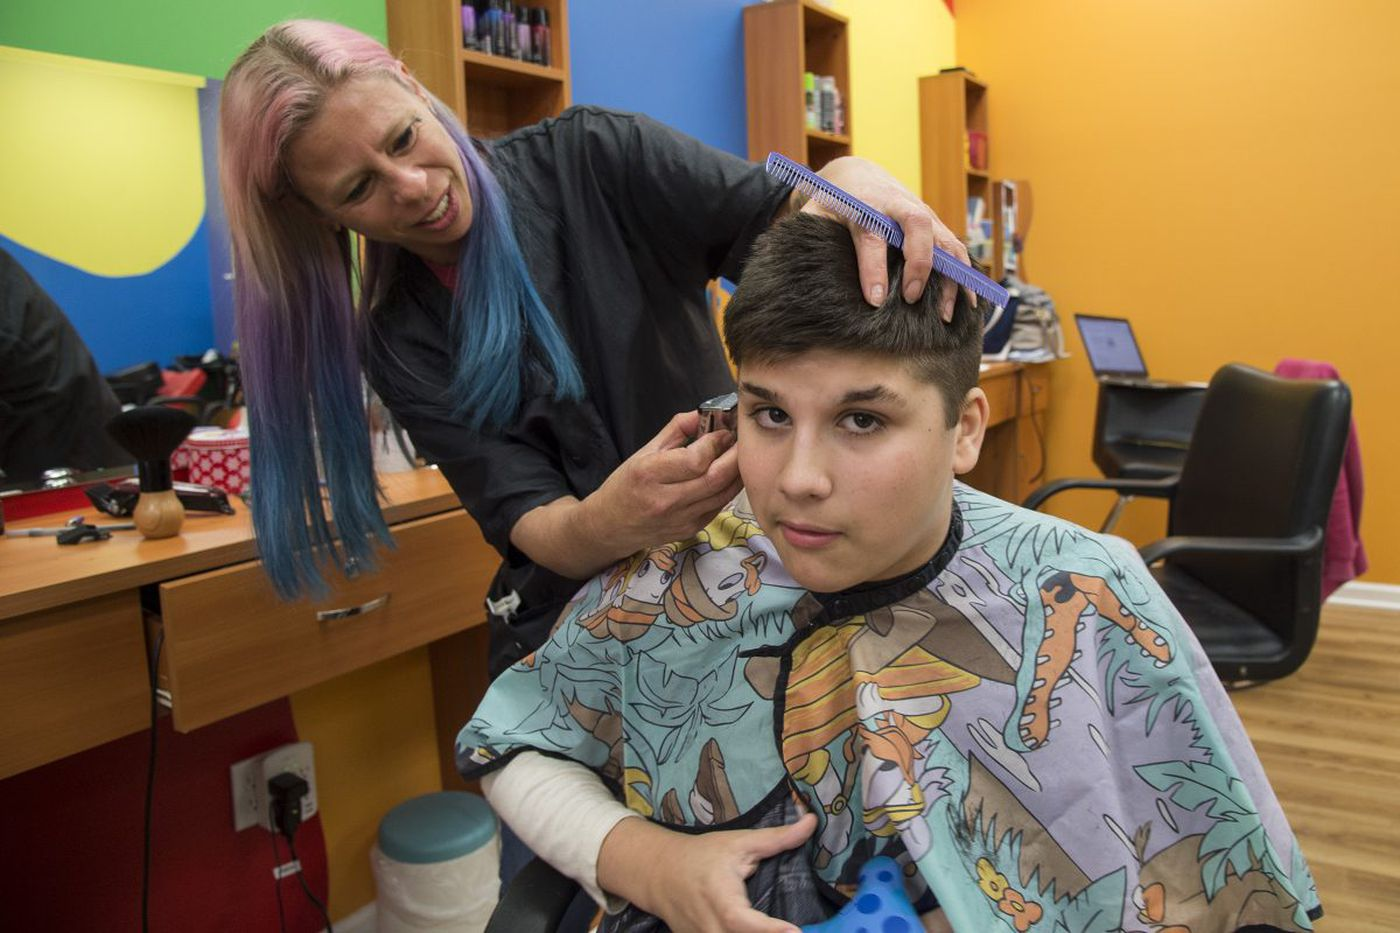 Training programs help professionals meet autistic children's everyday needs